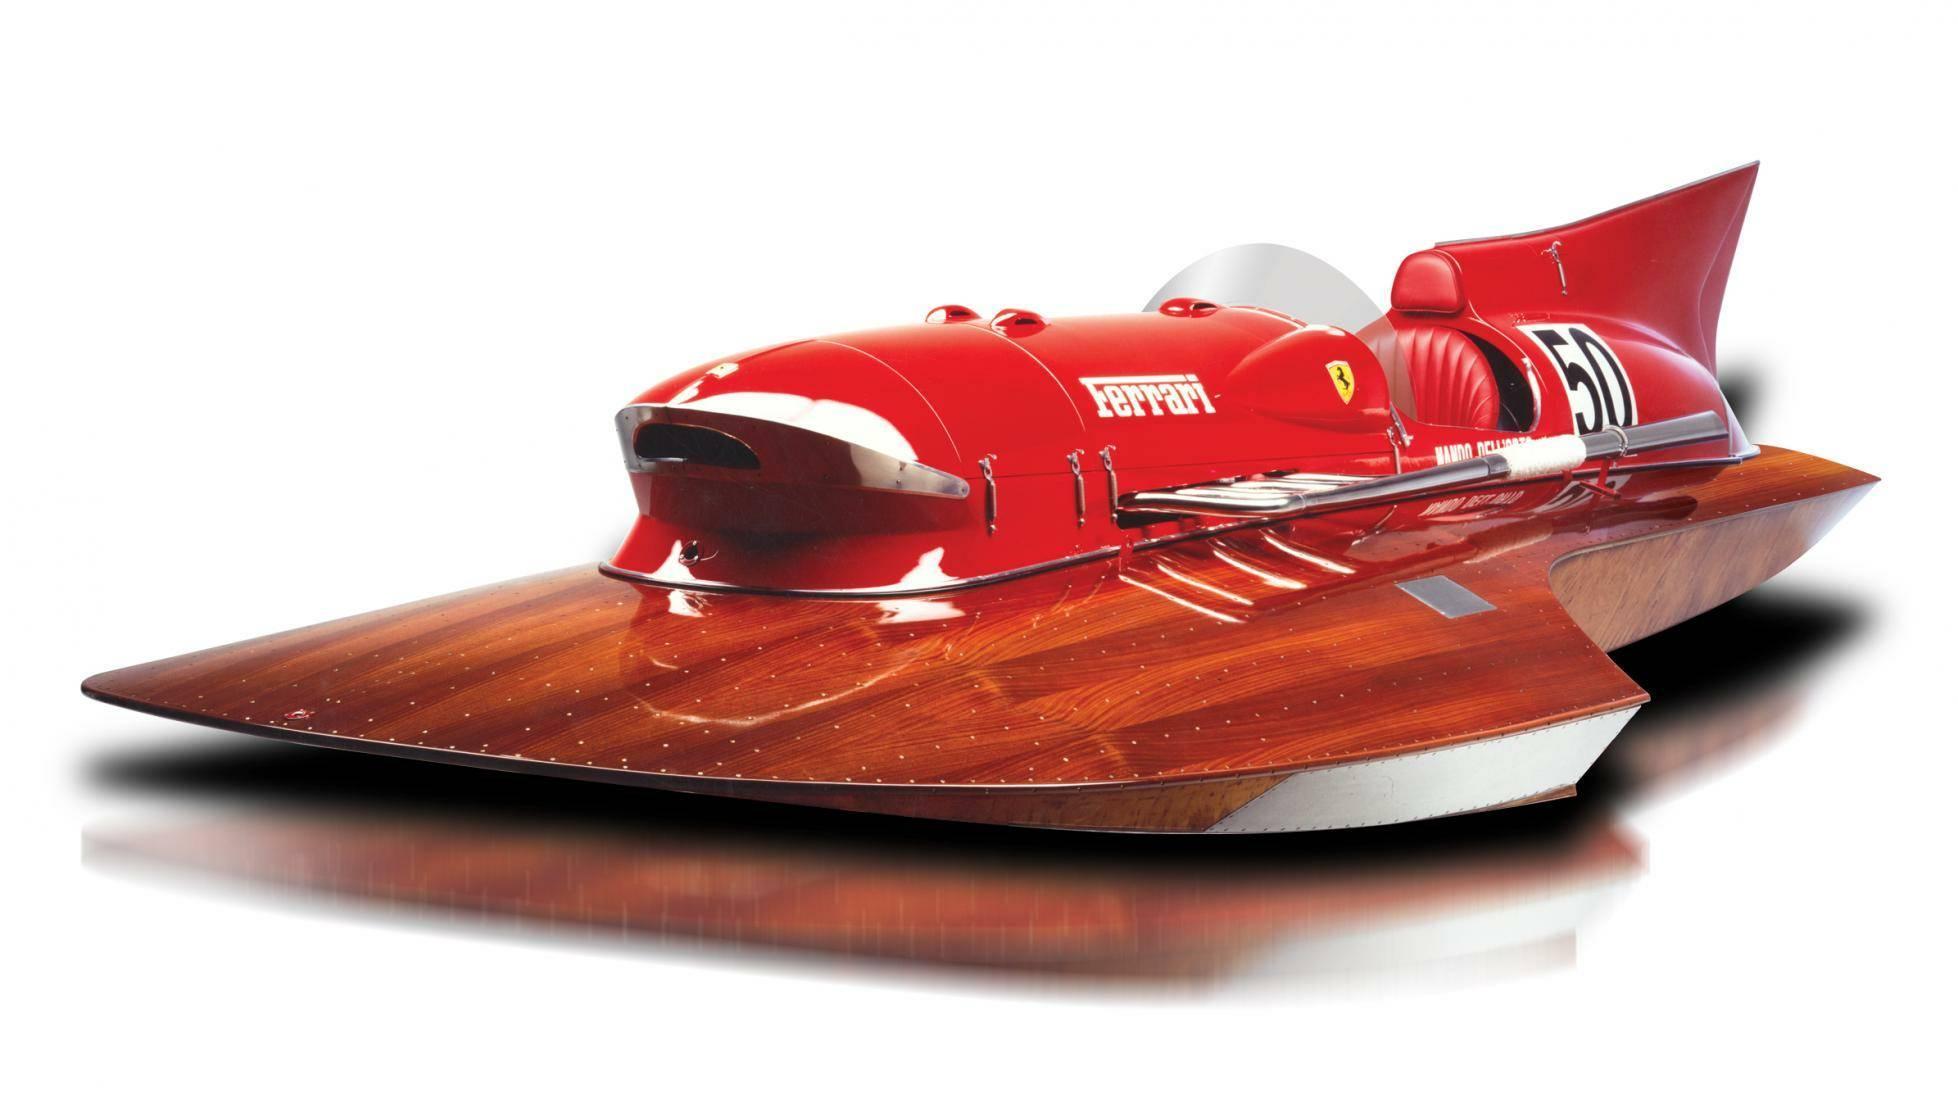 Zanimljivost dana: Ferrarijev čamac rekorder